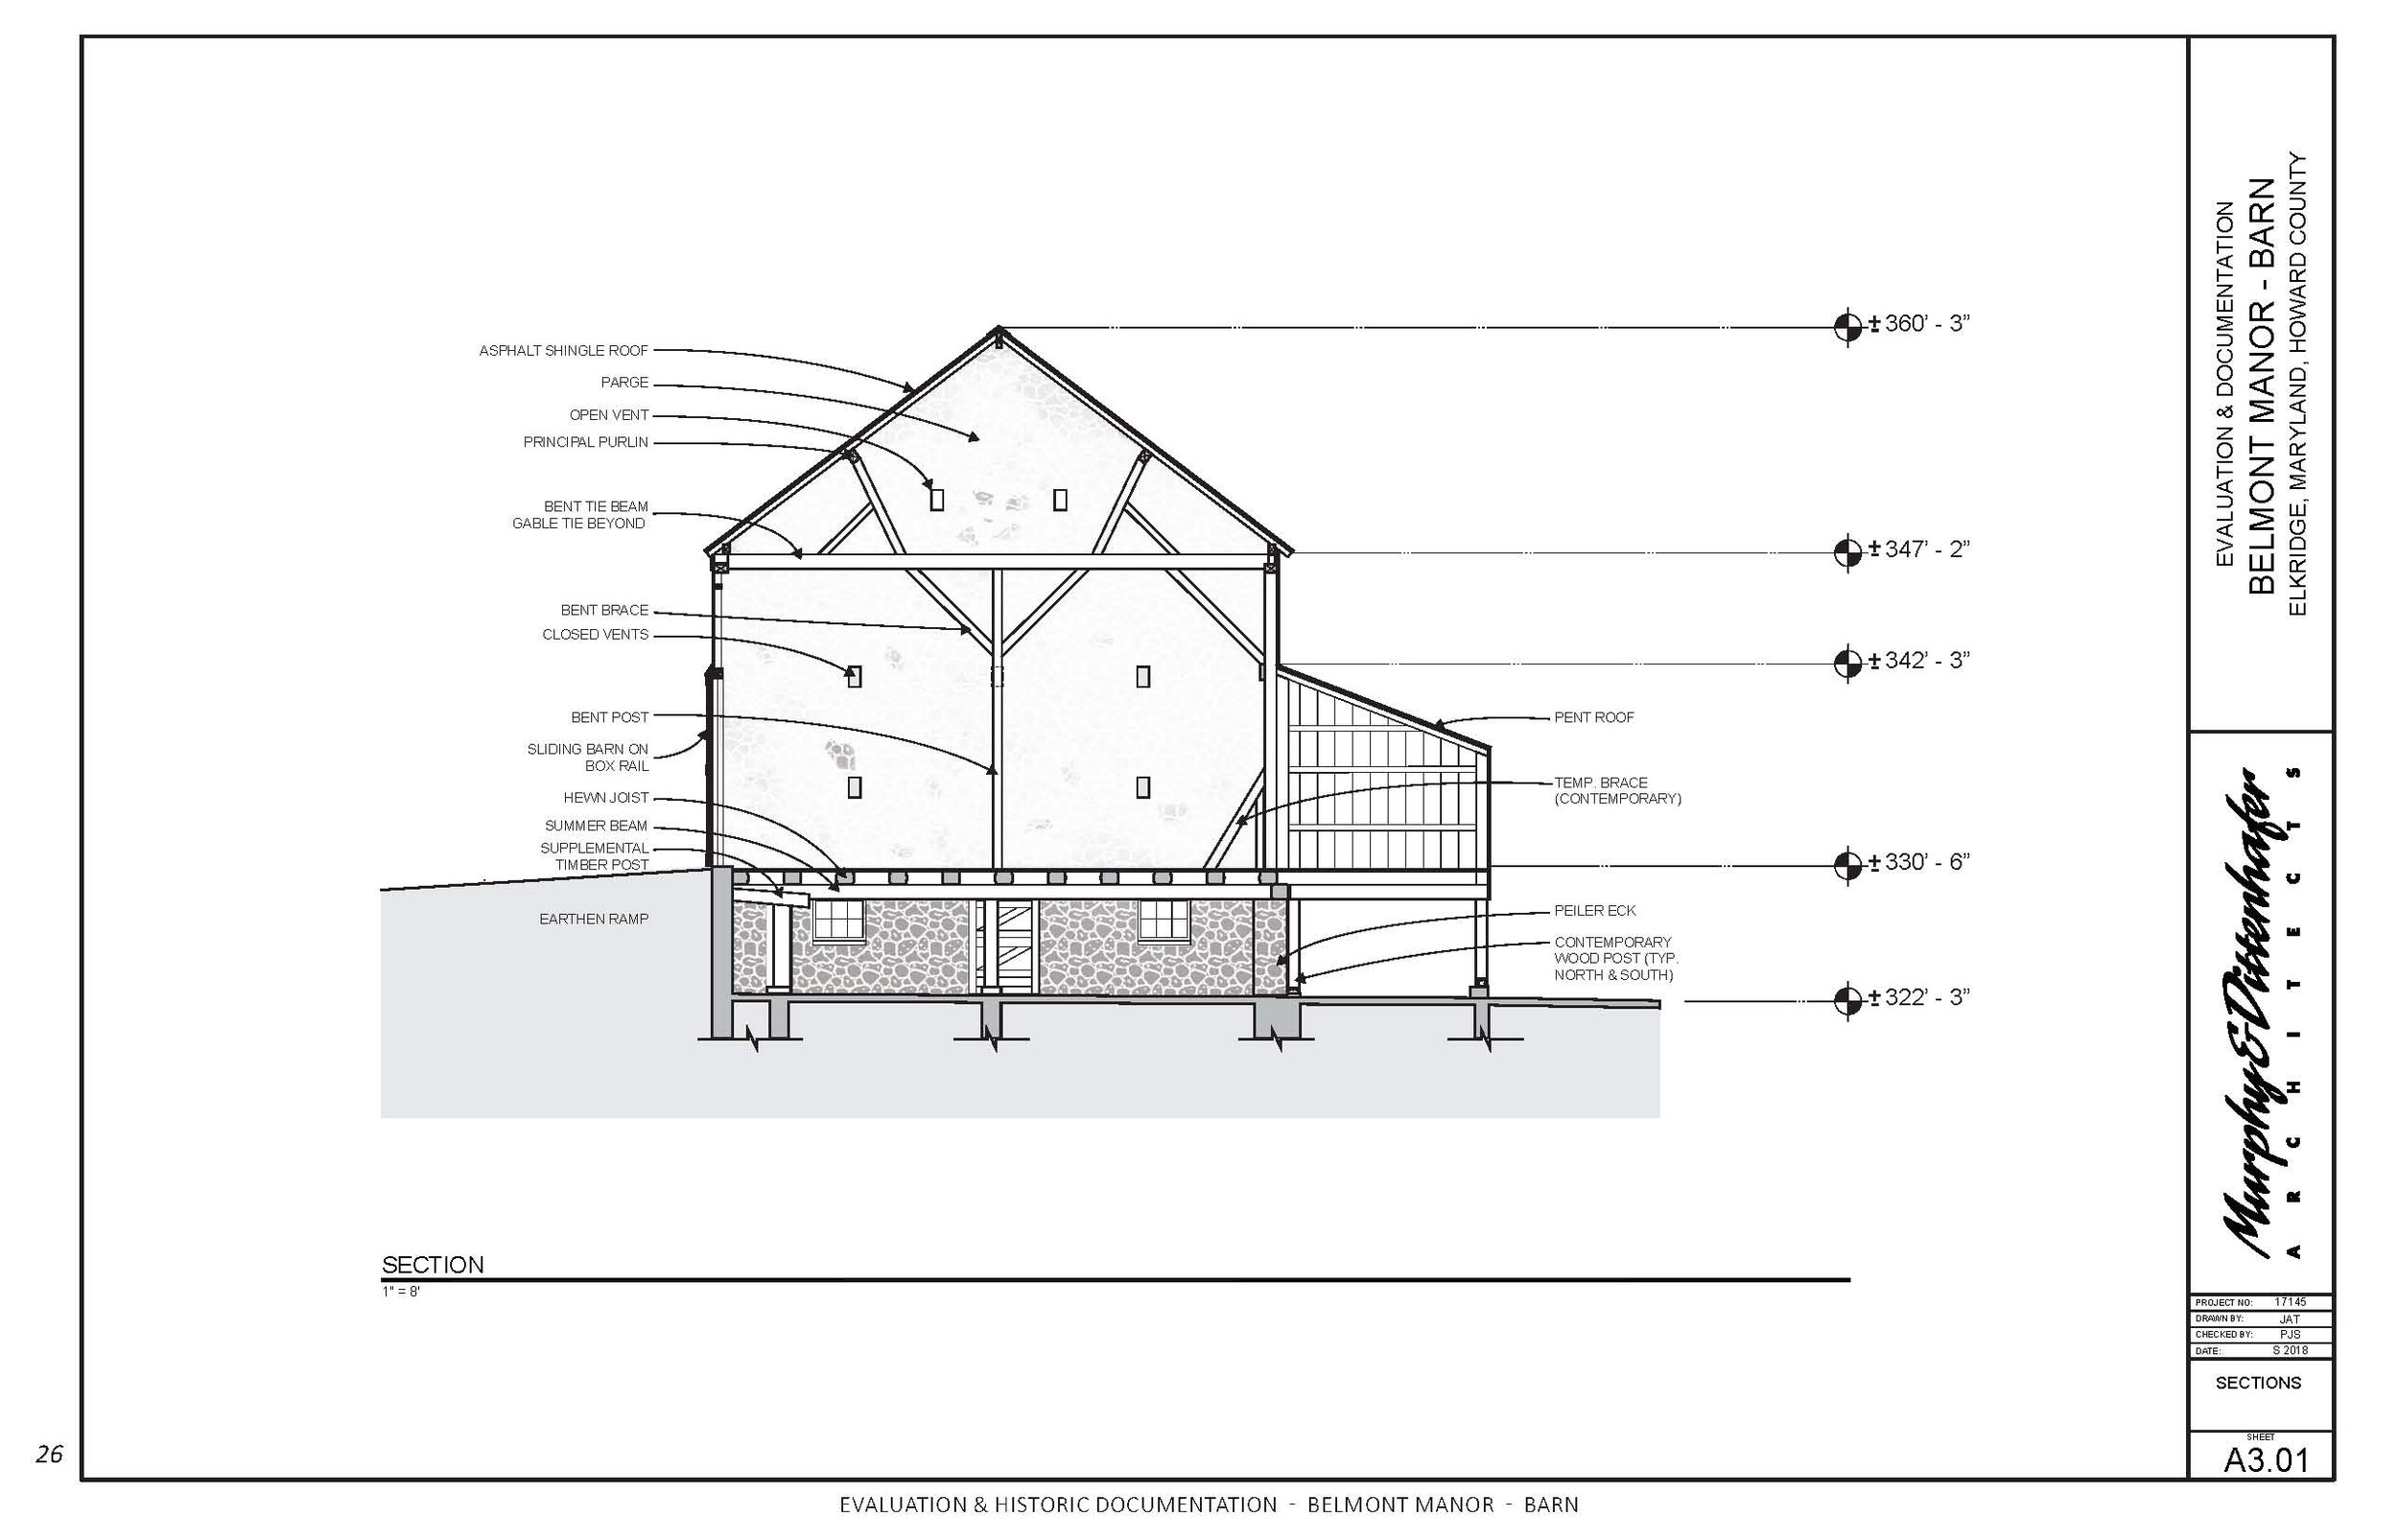 042418_17145 - Belmont Barn Study - Report - Final Draft_Page_30.jpg